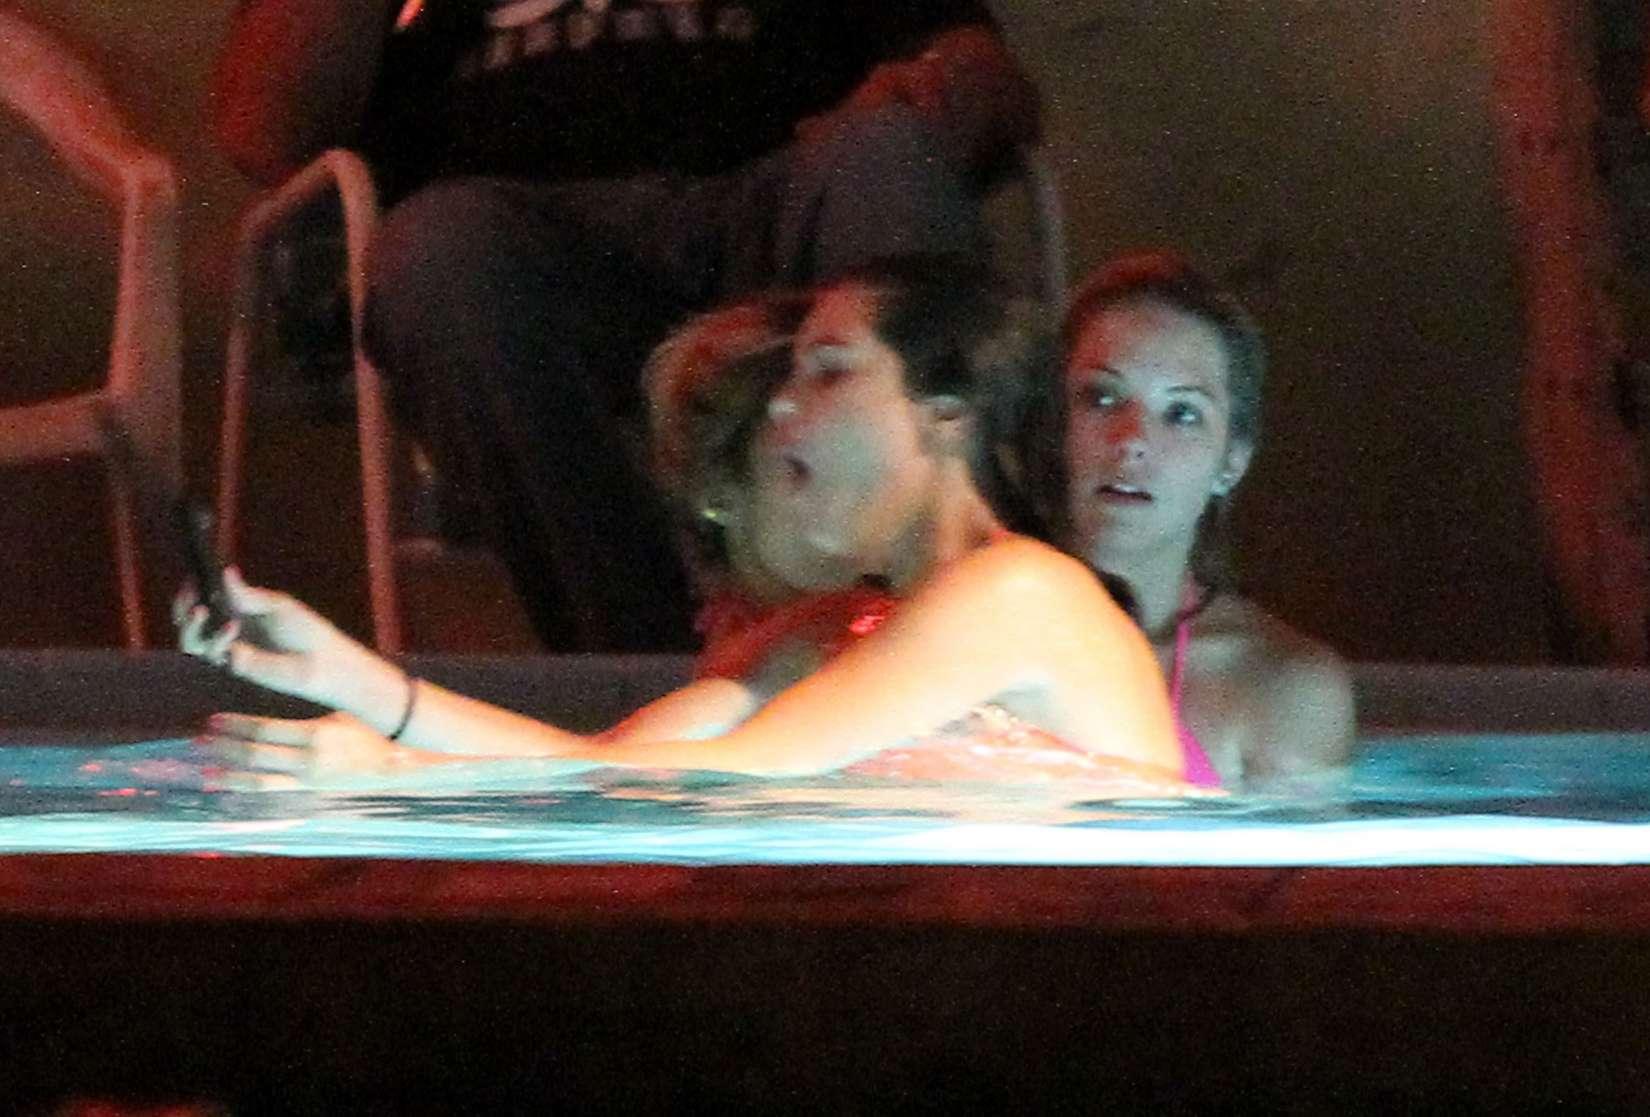 Selena Gomez And Vanessa Hudgens Bikini Pool Party On Set Of Spring Breakers 09 Gotceleb